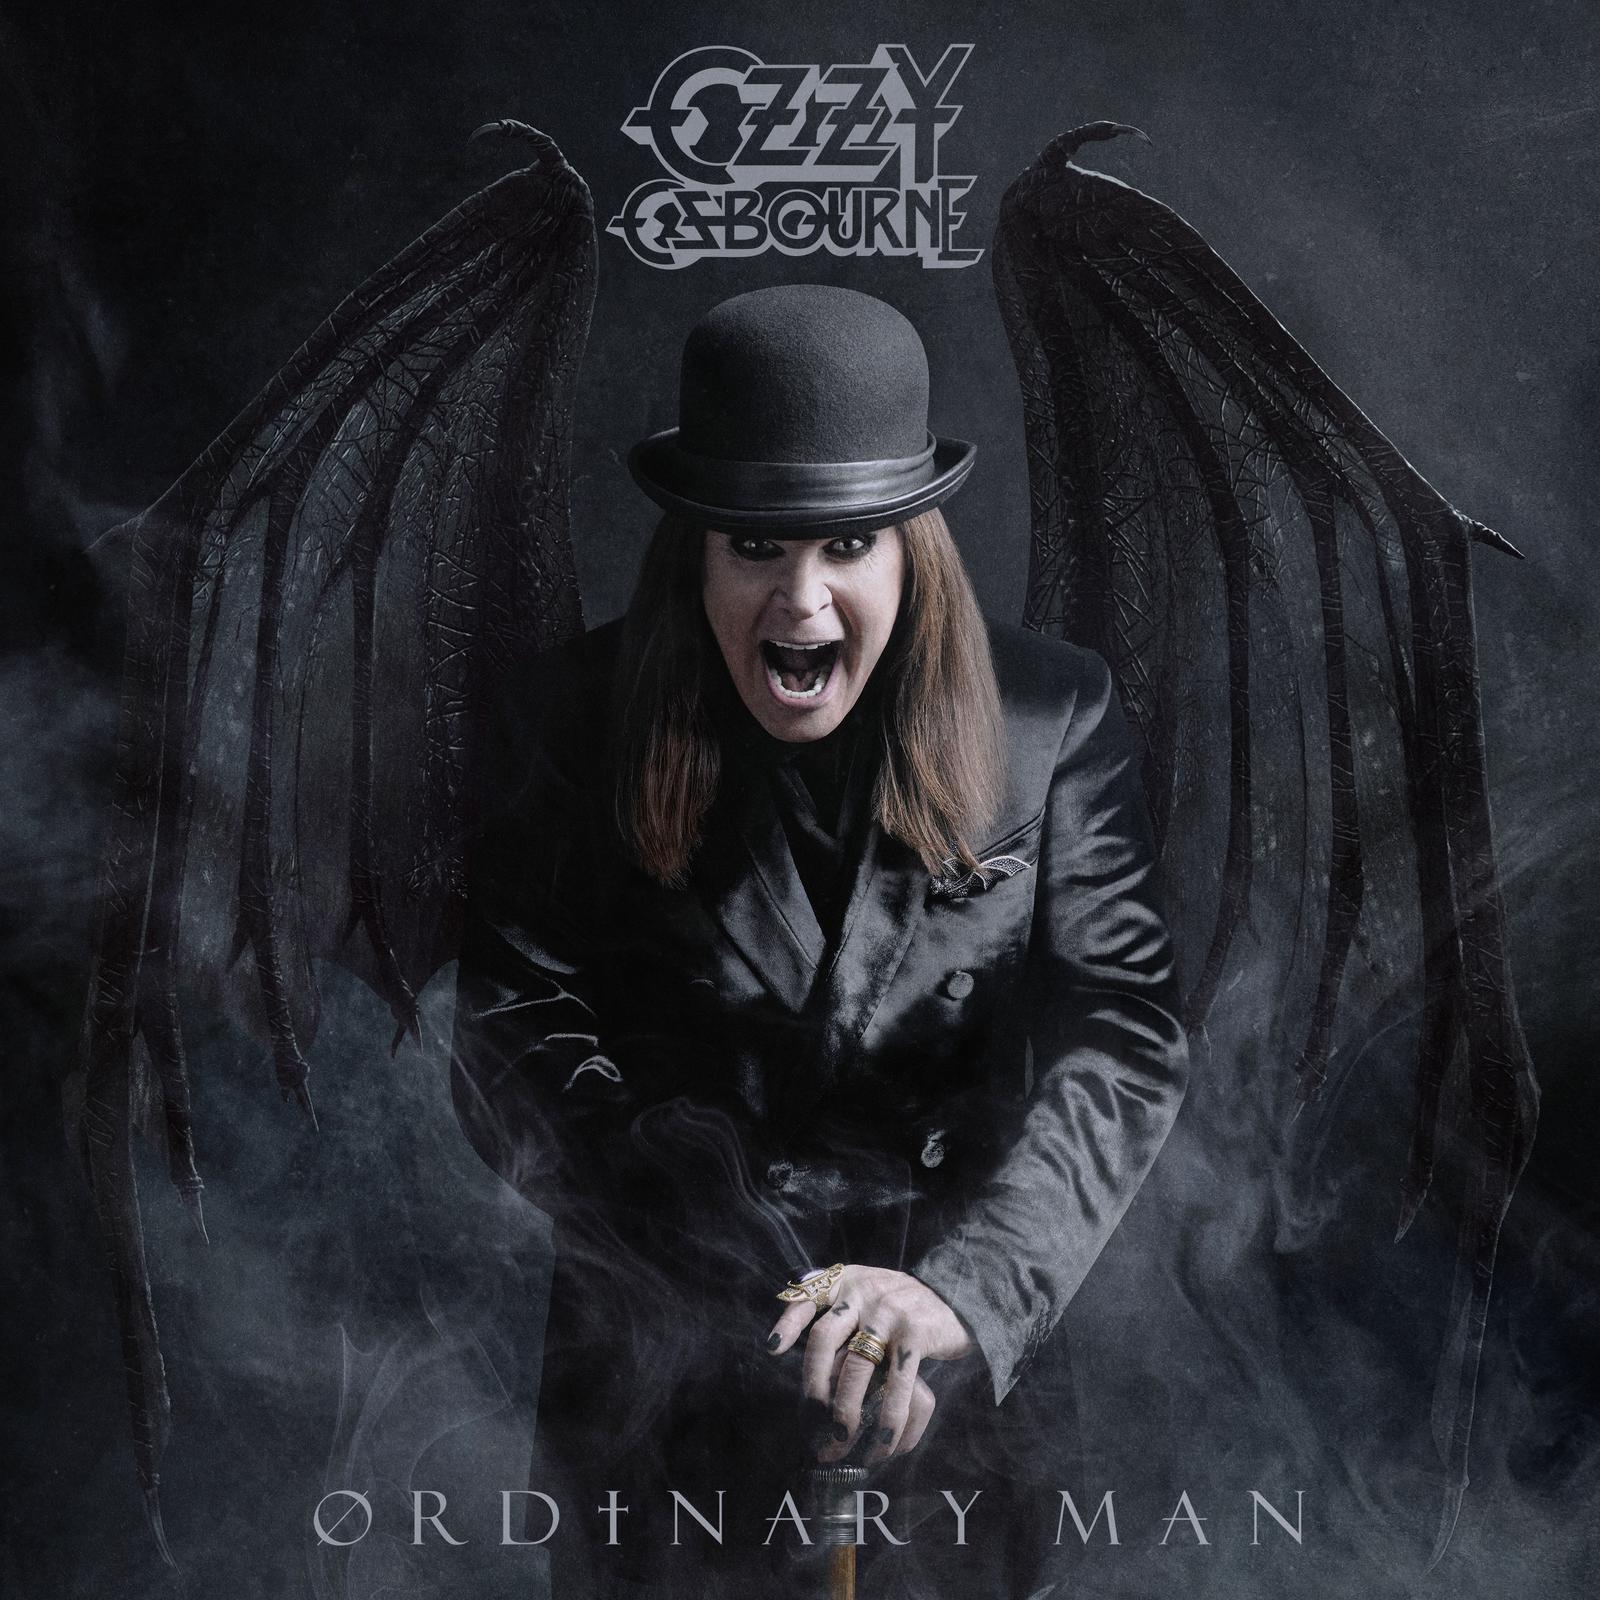 Ordinary Man (Ozzy Osbourne album)